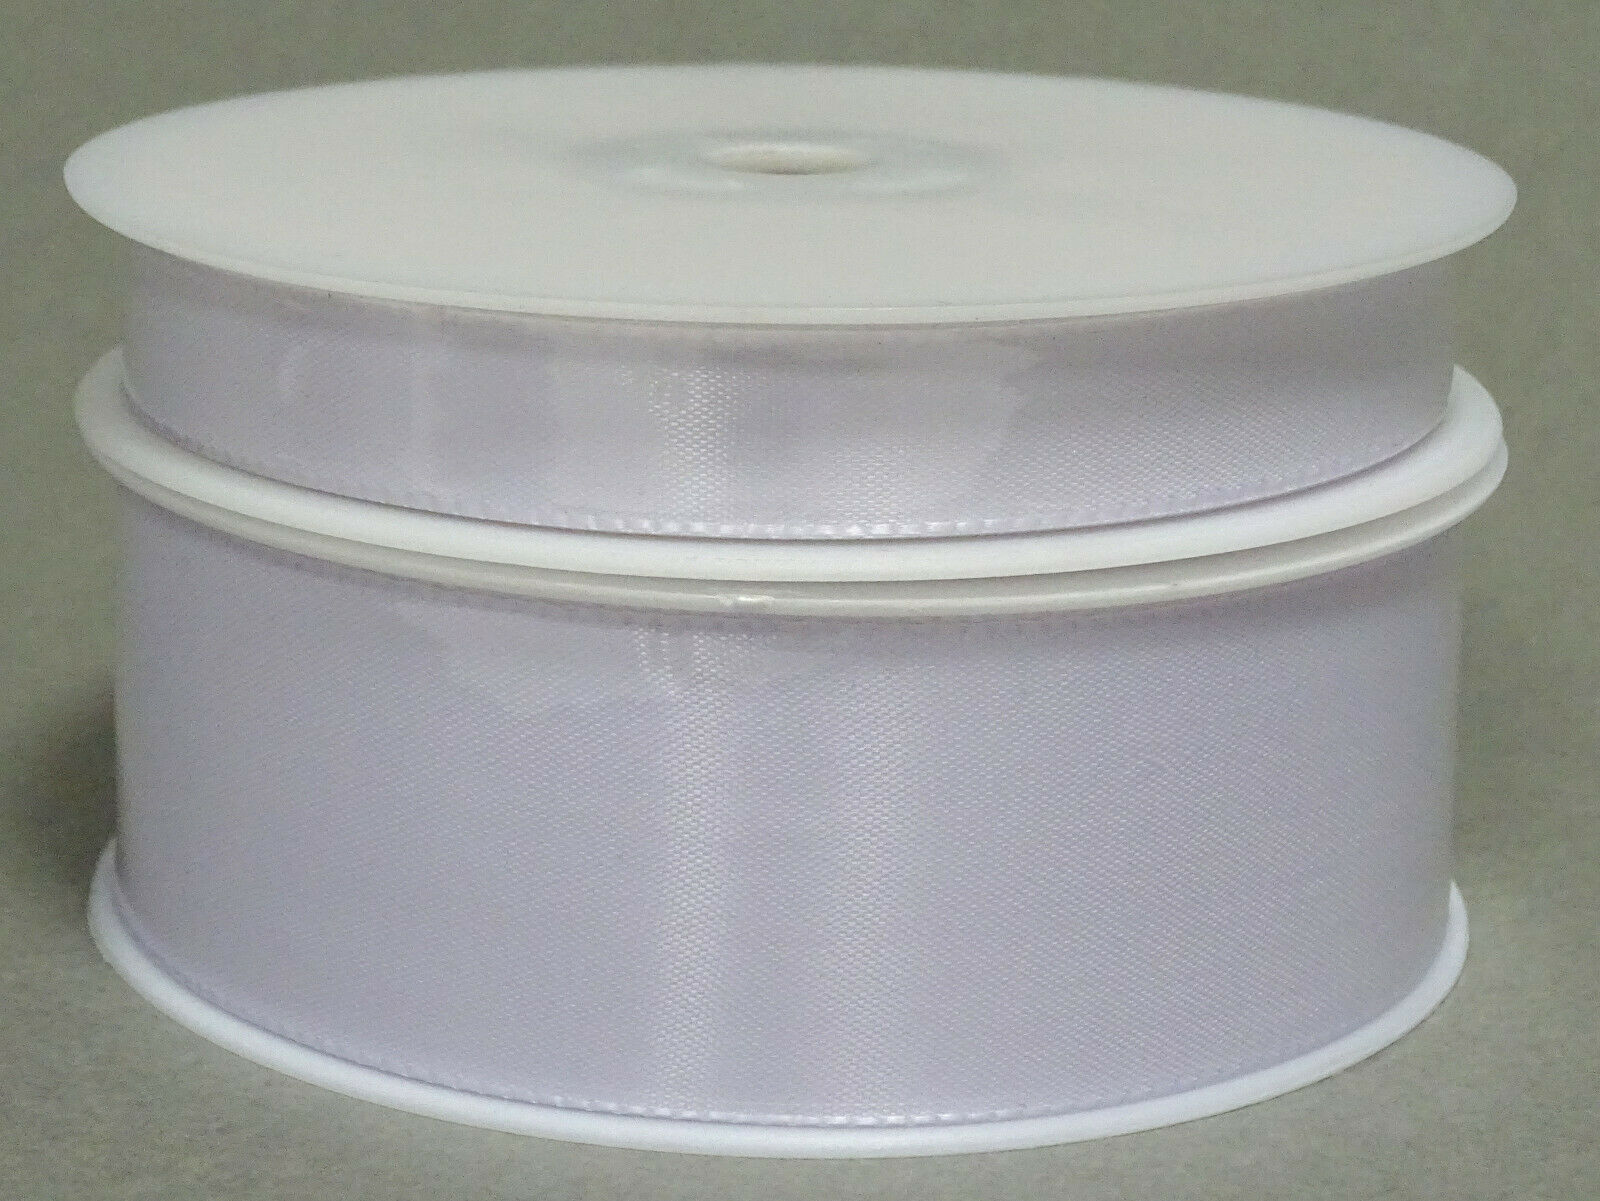 Seidenband Schleifenband 50 m x 15 mm / 40 mm Dekoband ab 0,08 €/m Geschenkband  - Weiß 101, 15 mm x 50 m